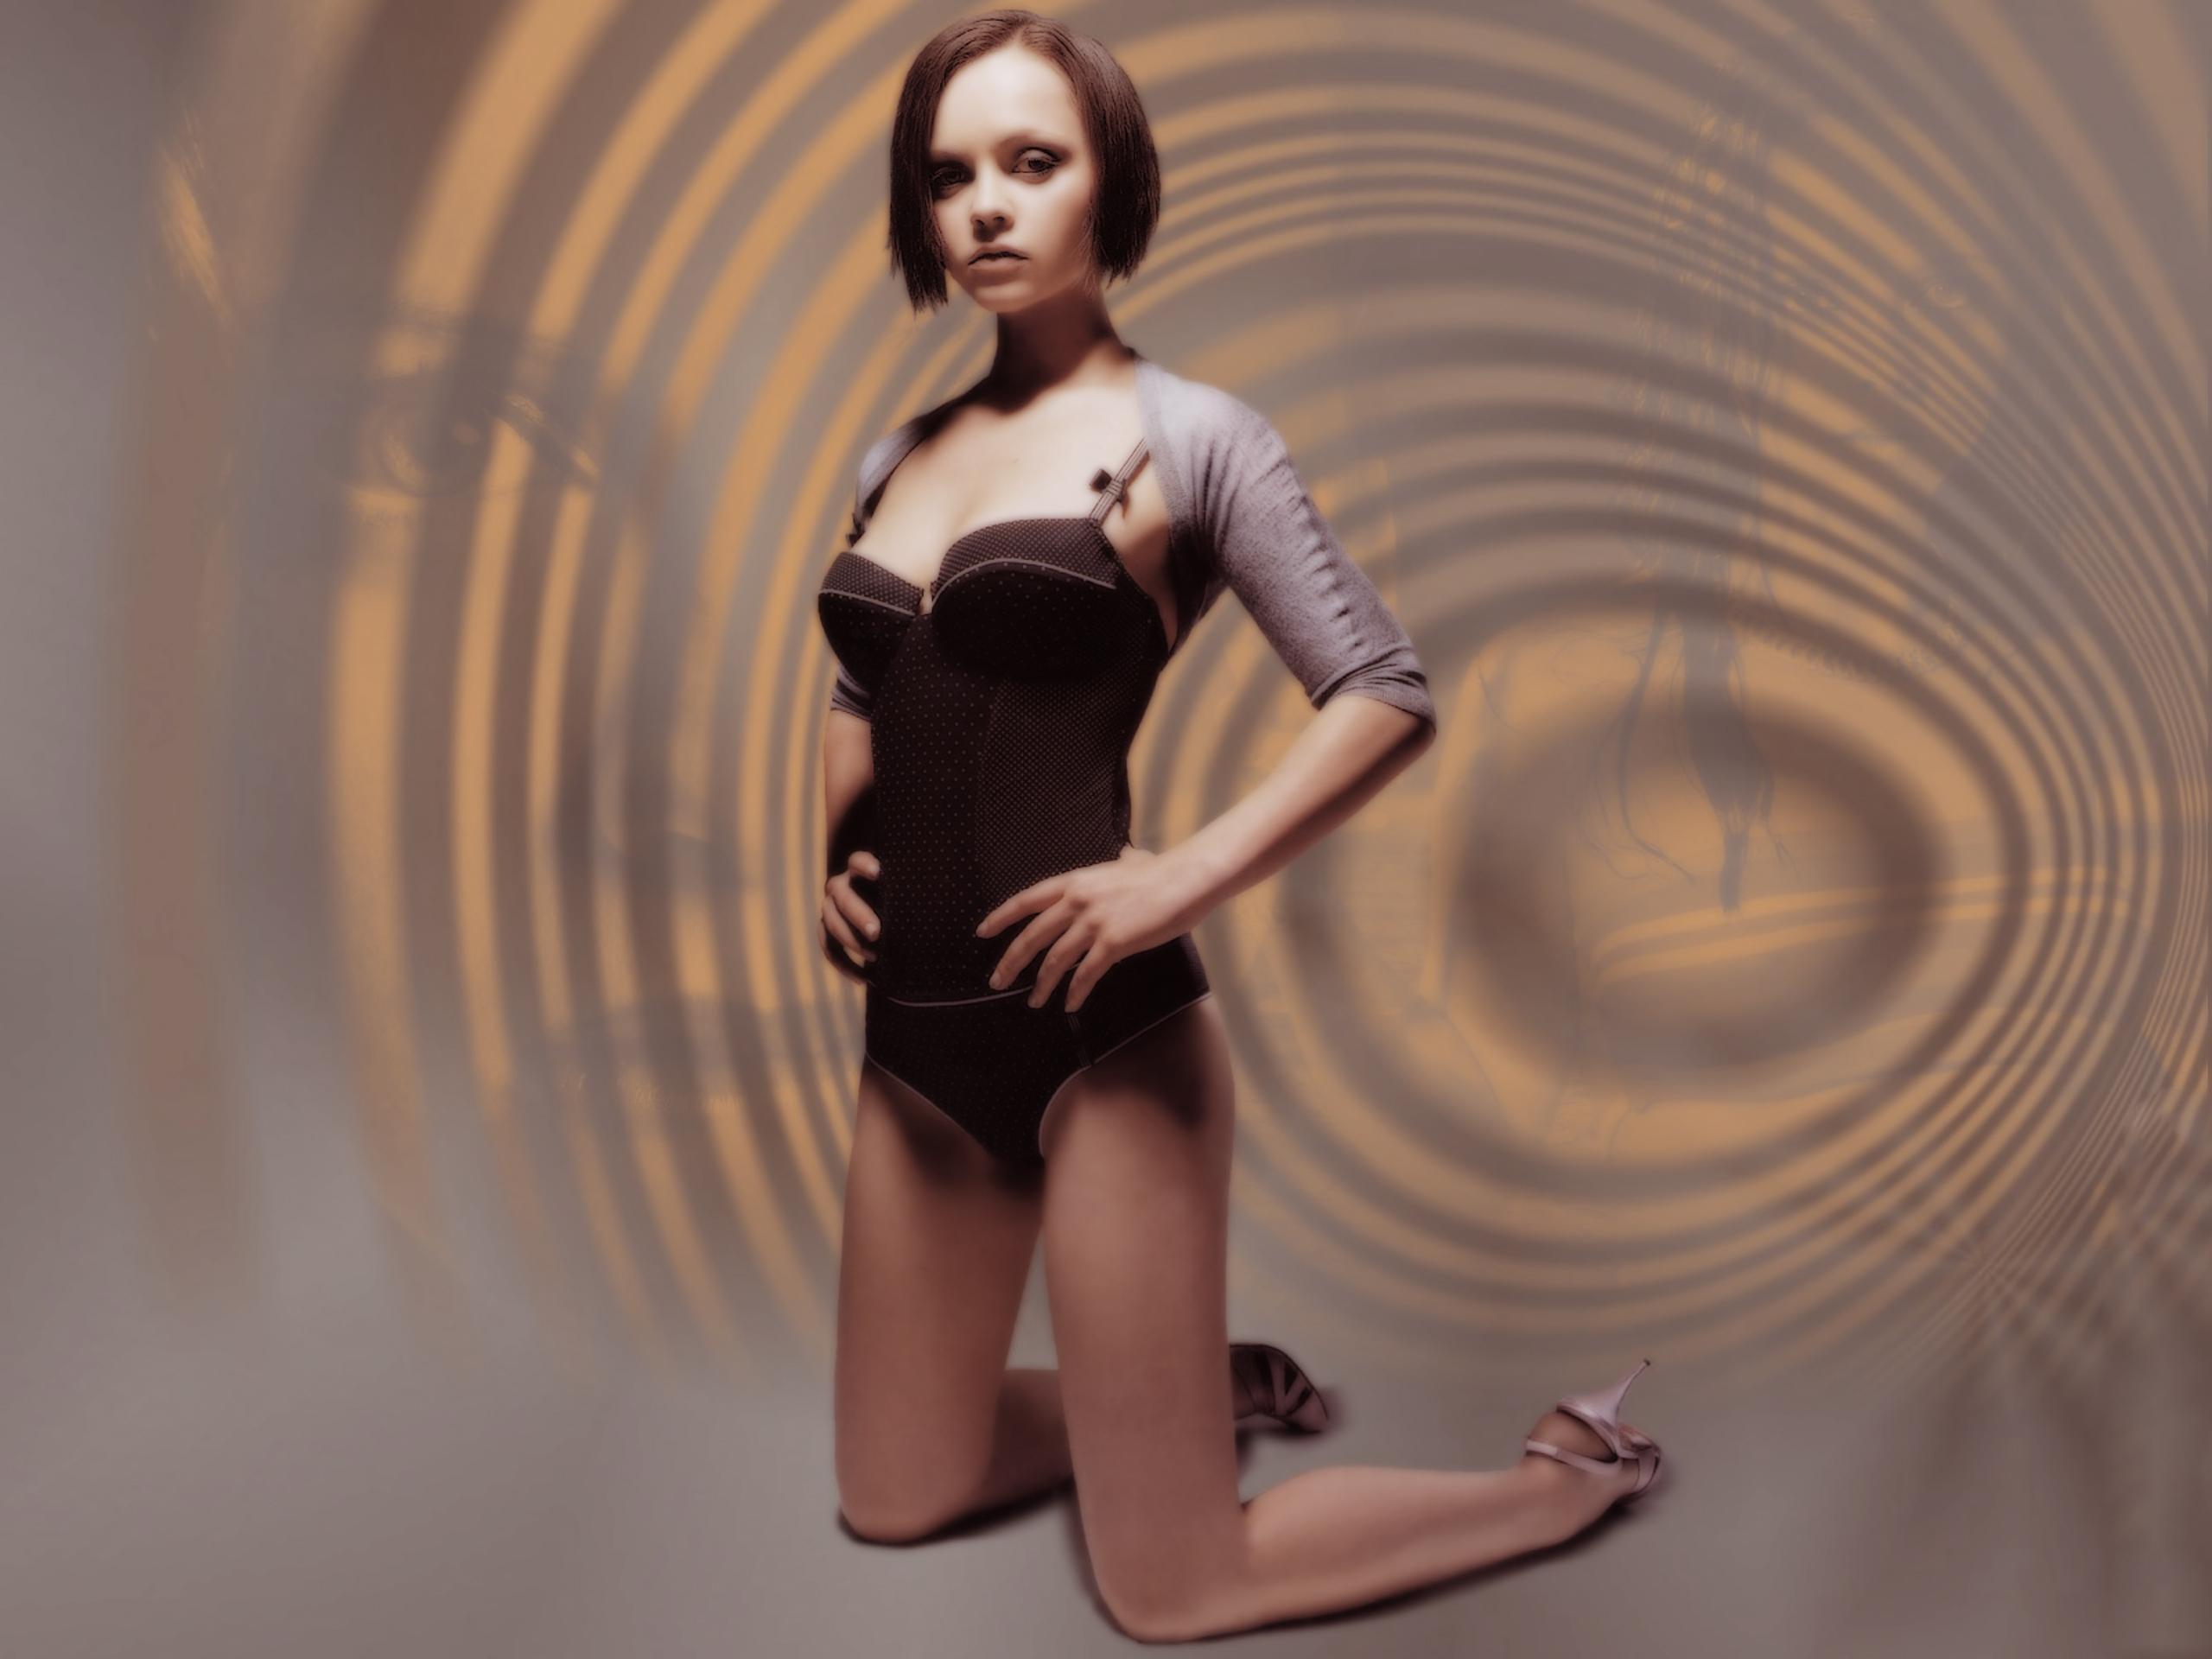 Christina Ricci | Free Desktop Wallpapers for HD, Widescreen and ... Christina Ricci